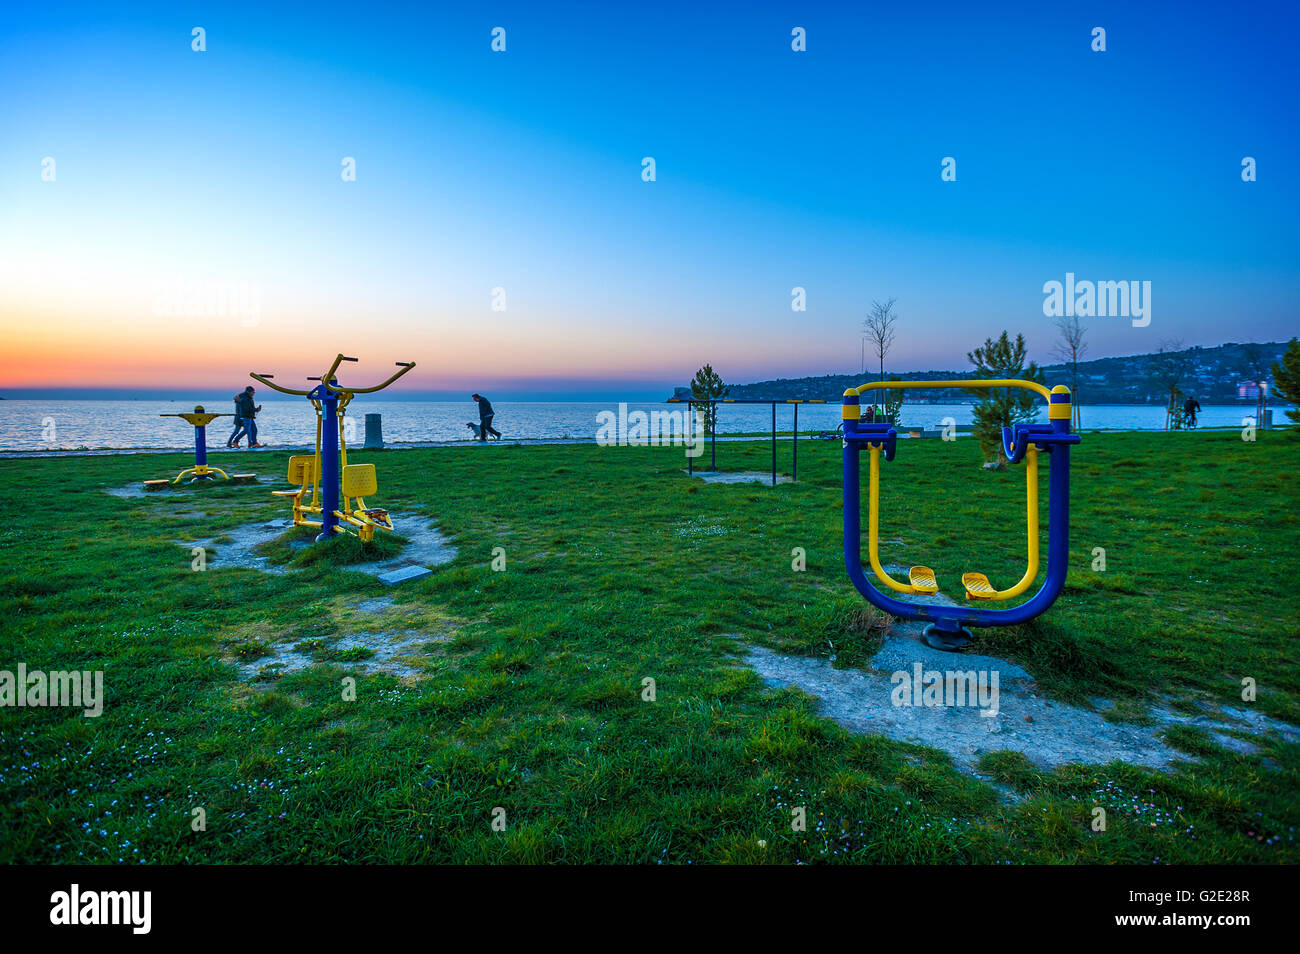 Slowenien-Küste und Kars mediterranen Strand Sportgeräte Stockbild